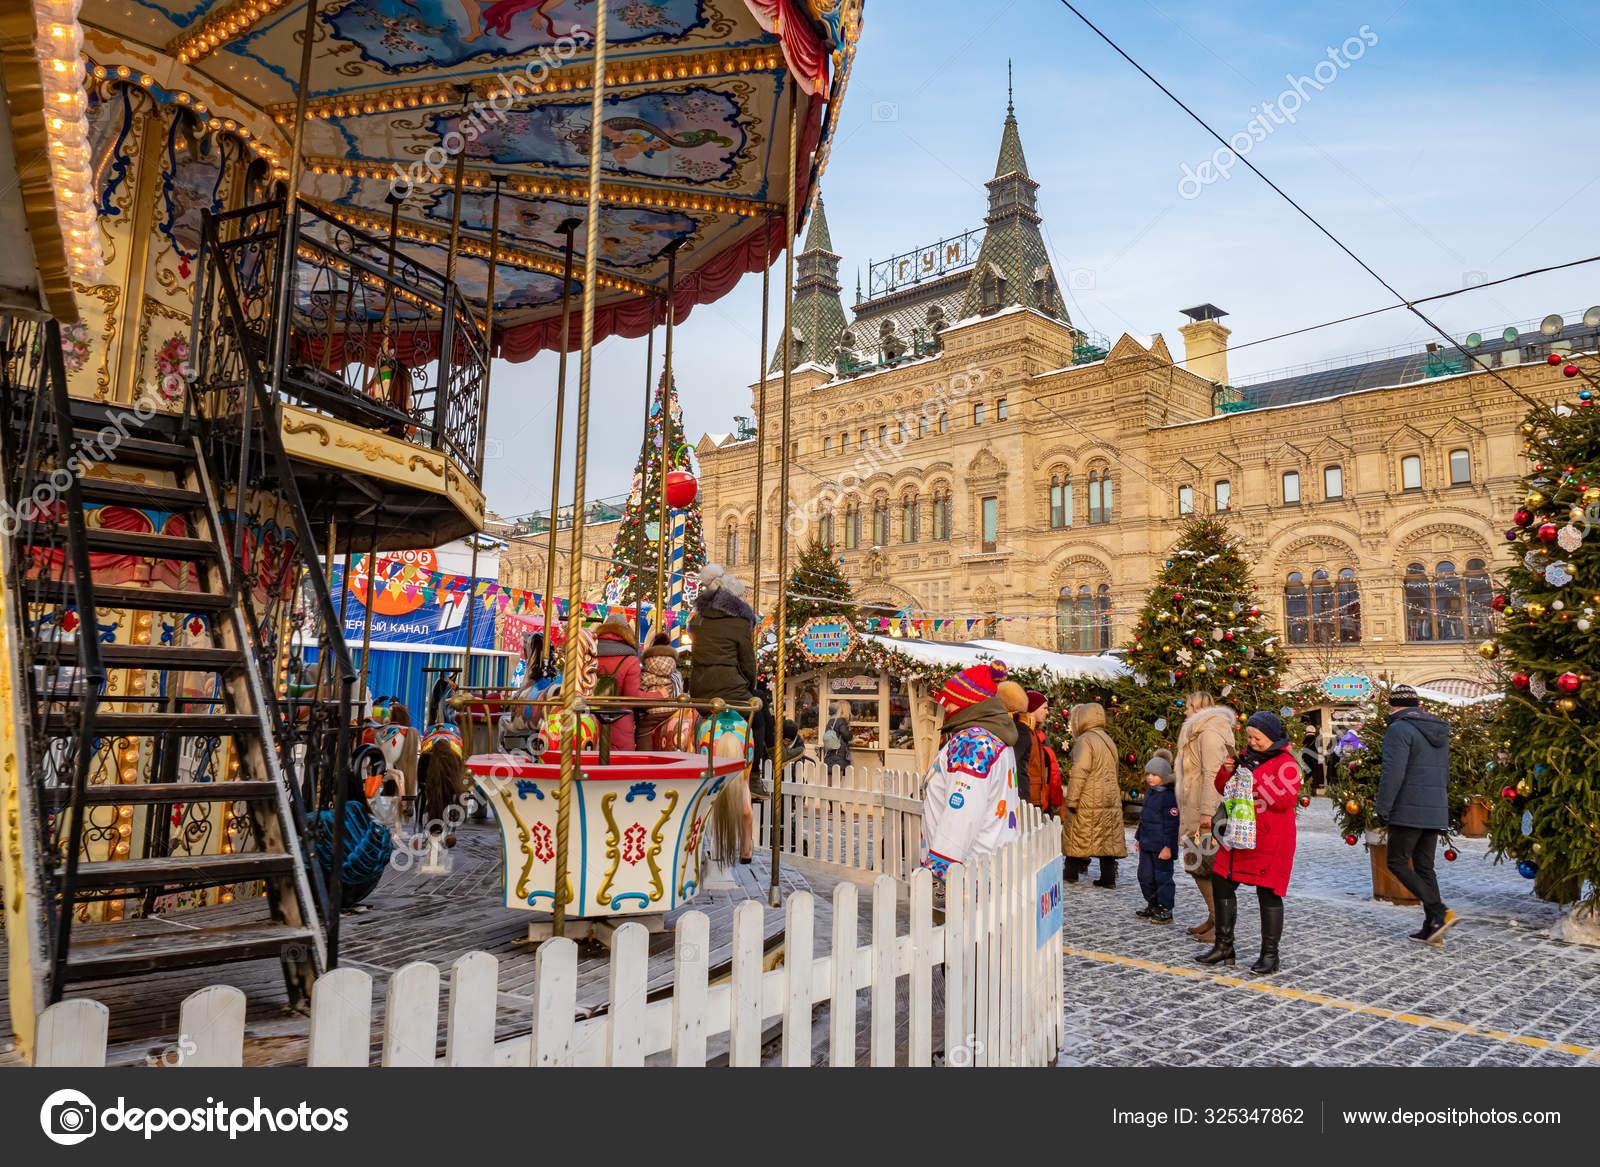 Deposit market in russia dissertation